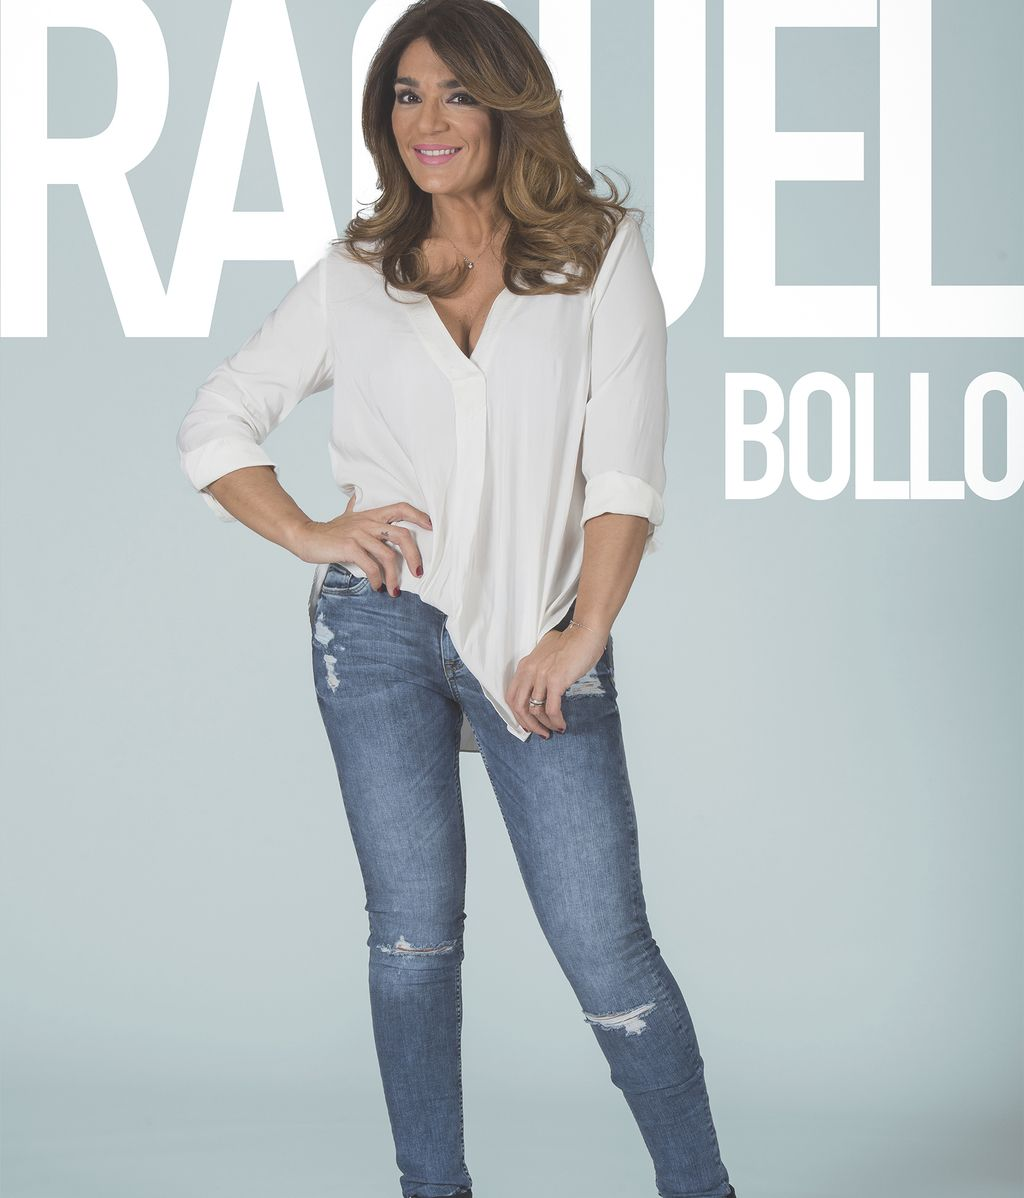 Raquel Bollo quiere mostrar su faceta familiar